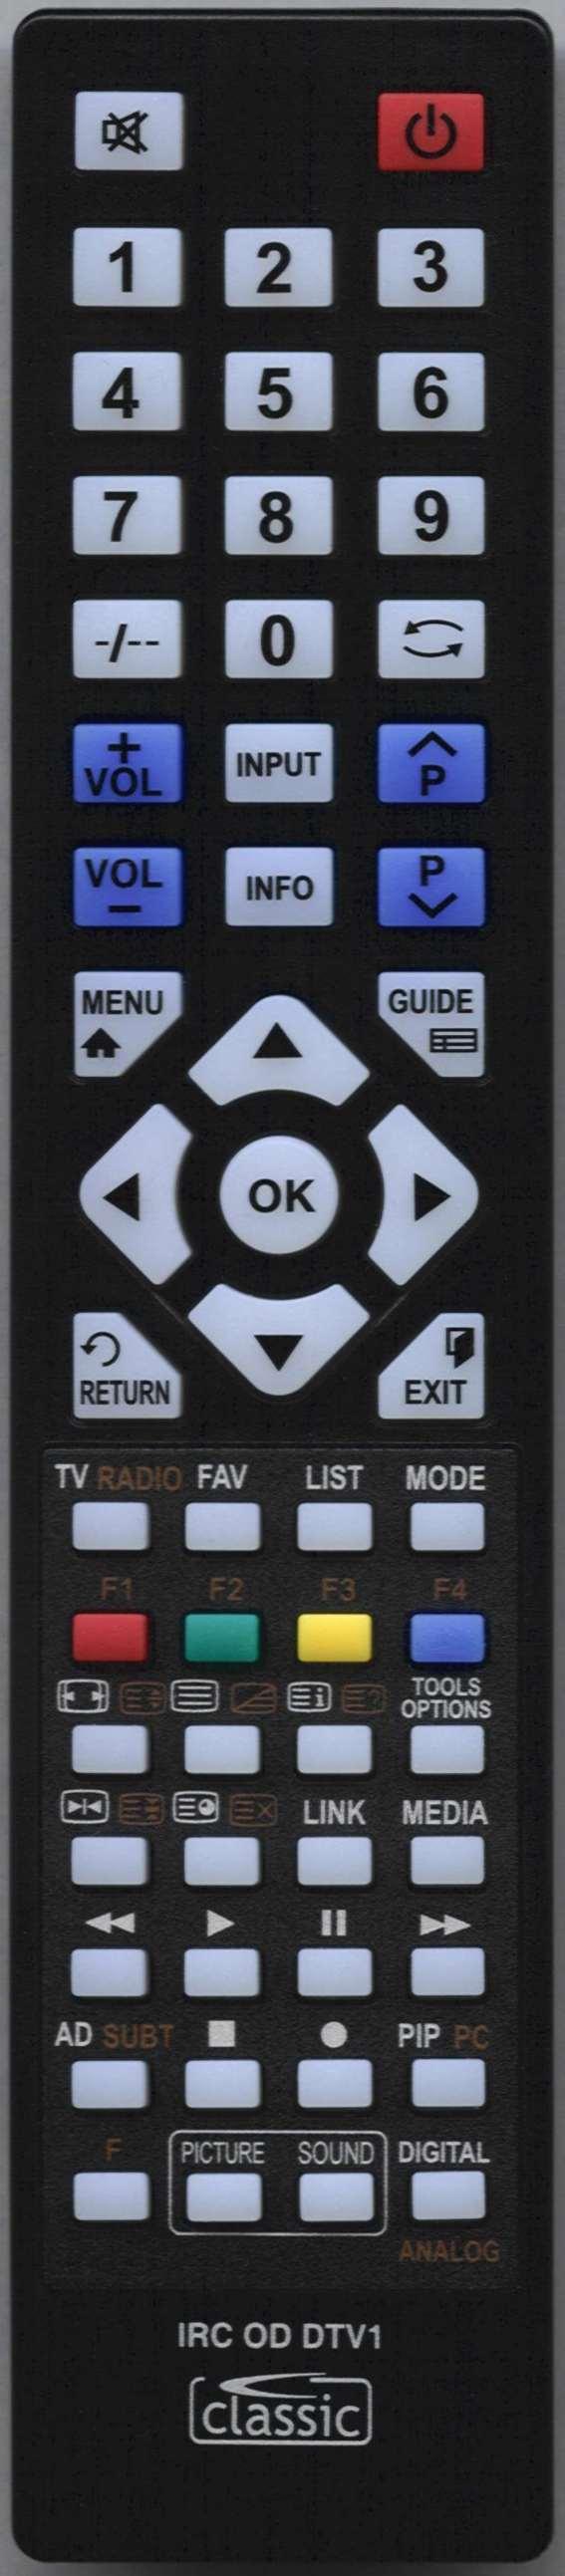 WHARFEDALE LT15T1CBW Remote Control